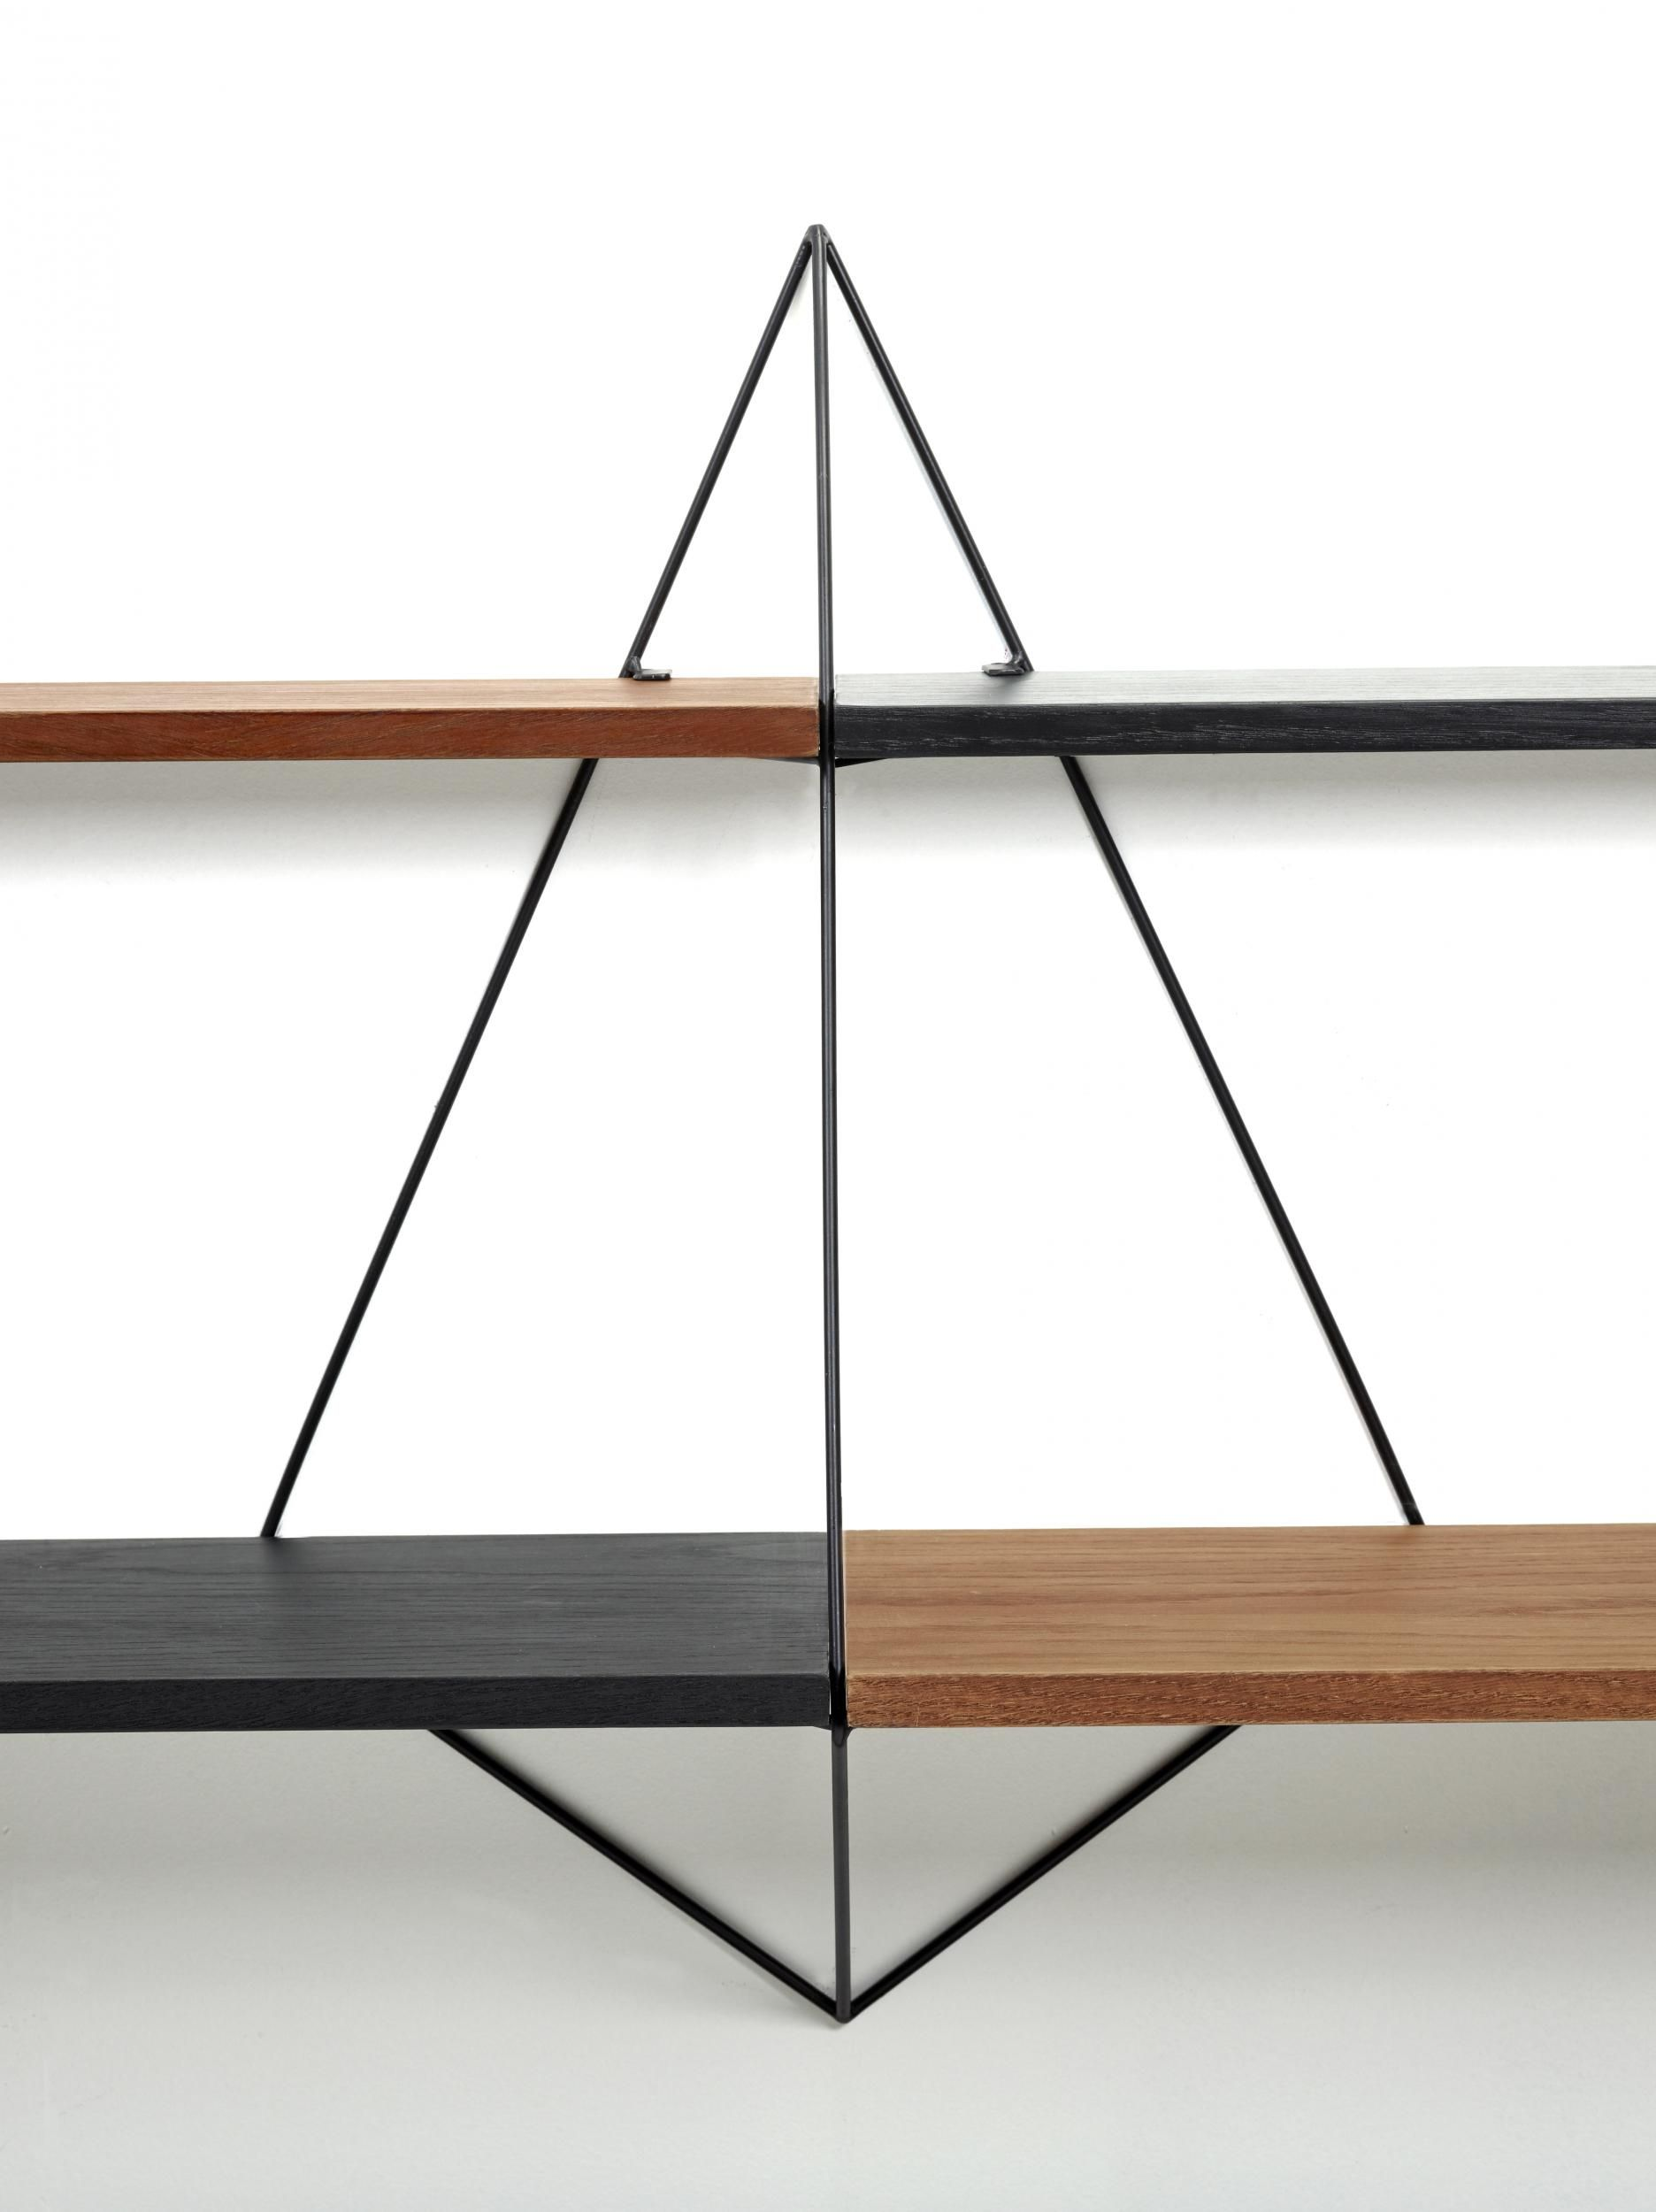 butterfly regal l 150 cm x h 64 cm holzfarben schwarz gestell schwarz by serax made in. Black Bedroom Furniture Sets. Home Design Ideas